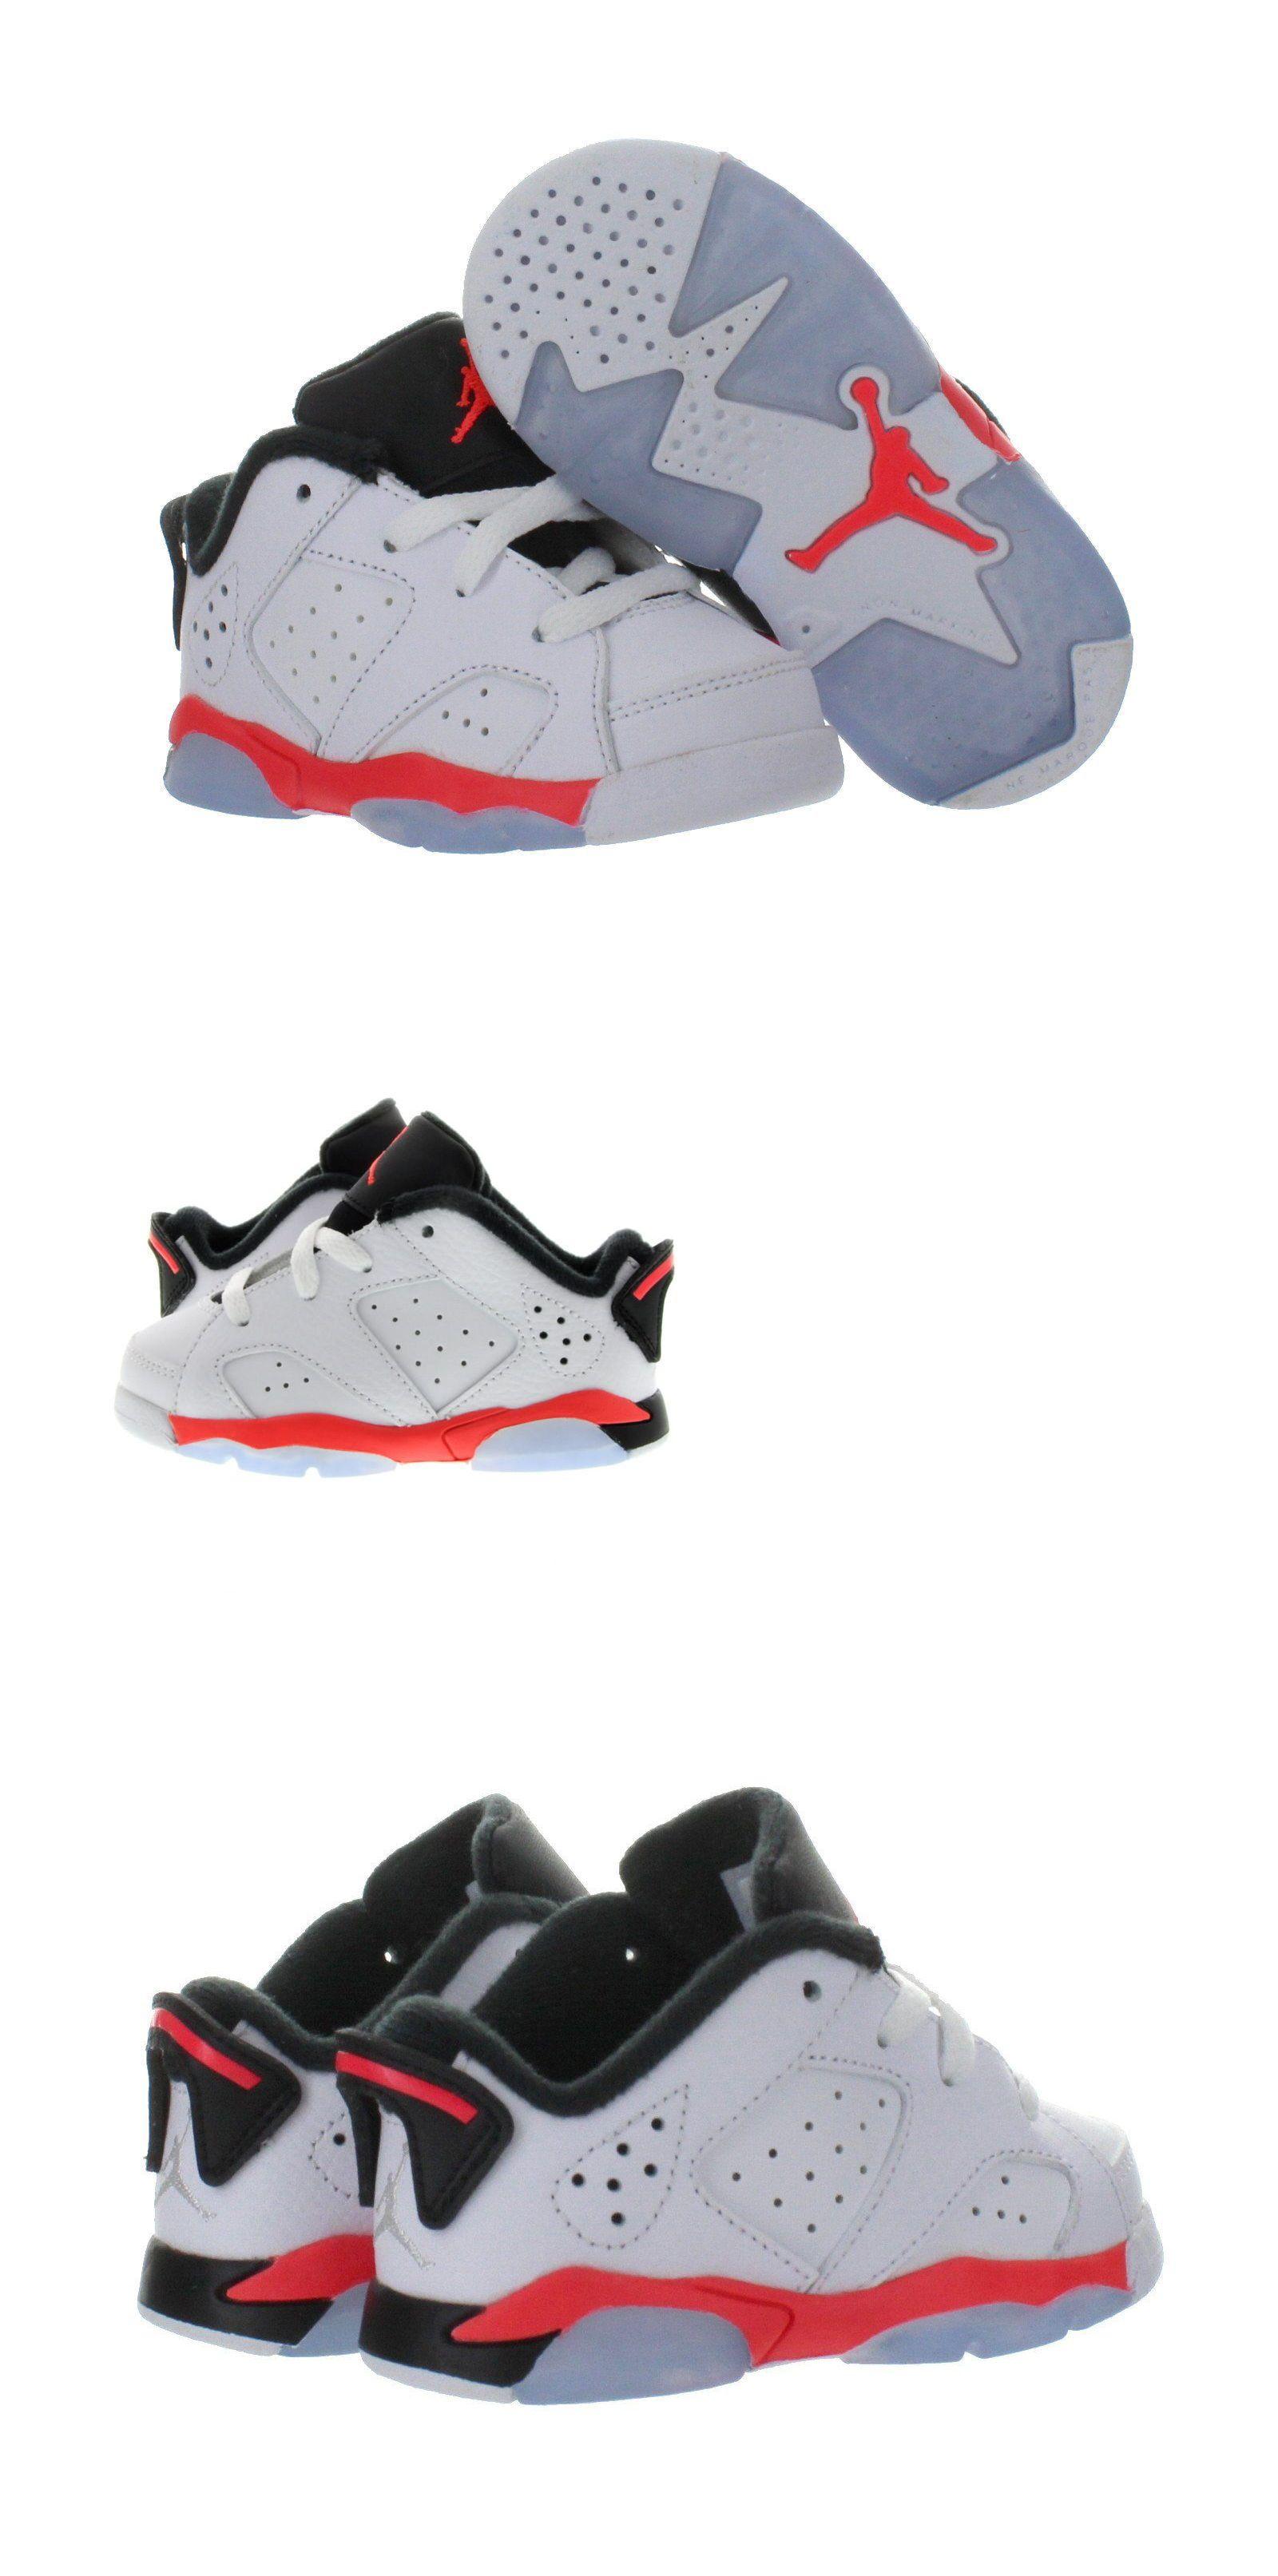 timeless design 7488c b61d1 Baby Shoes 147285  Toddler Nike Air Jordan Vi 6 Retro Sneakers New, White  Infrared 768883-123 -  BUY IT NOW ONLY   39.99 on eBay!